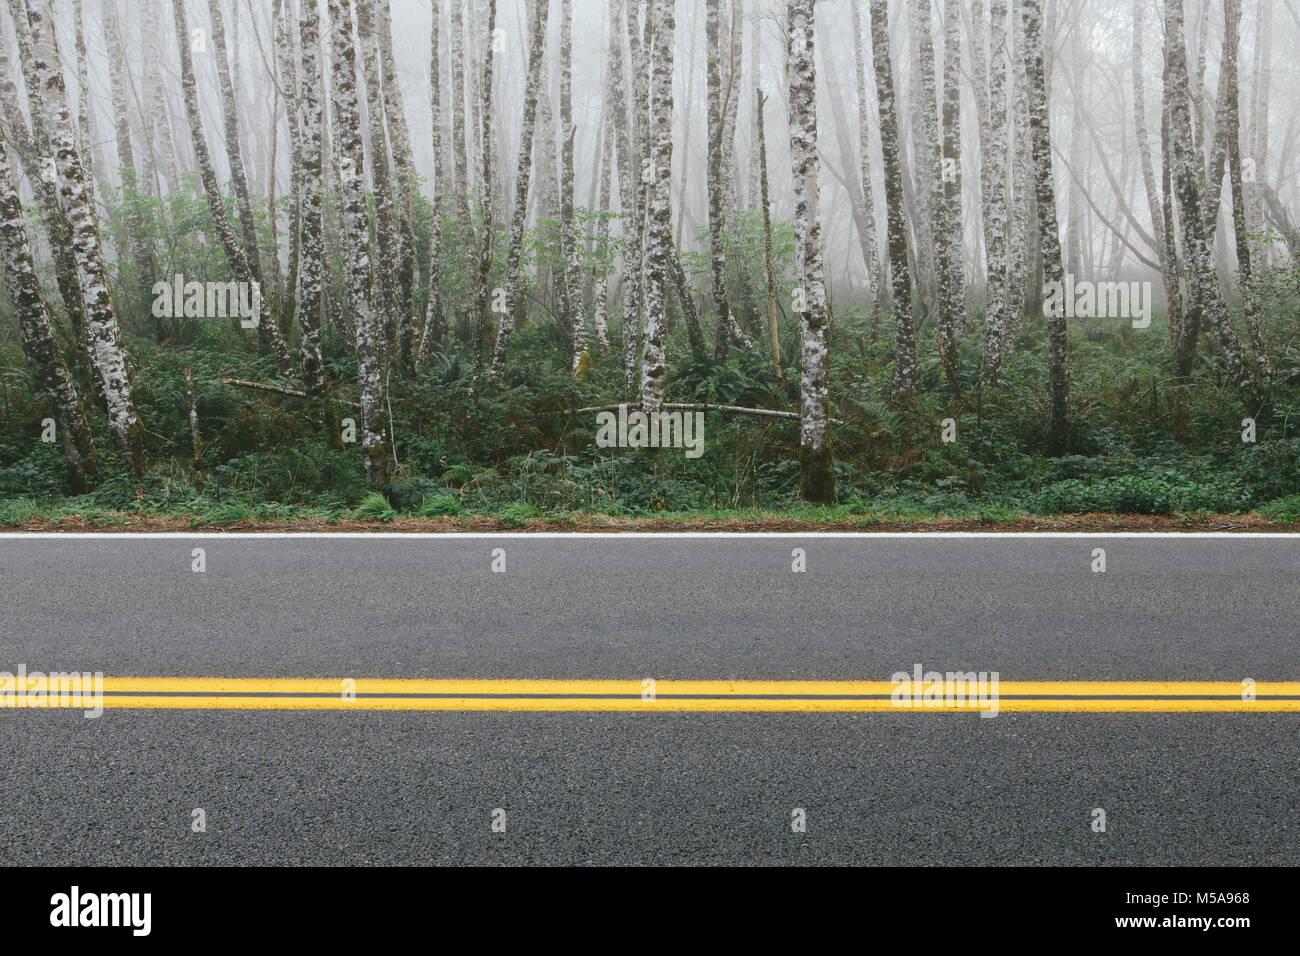 Rural highway through dense woodland, alder trees with slim straight tree trunks. - Stock Image